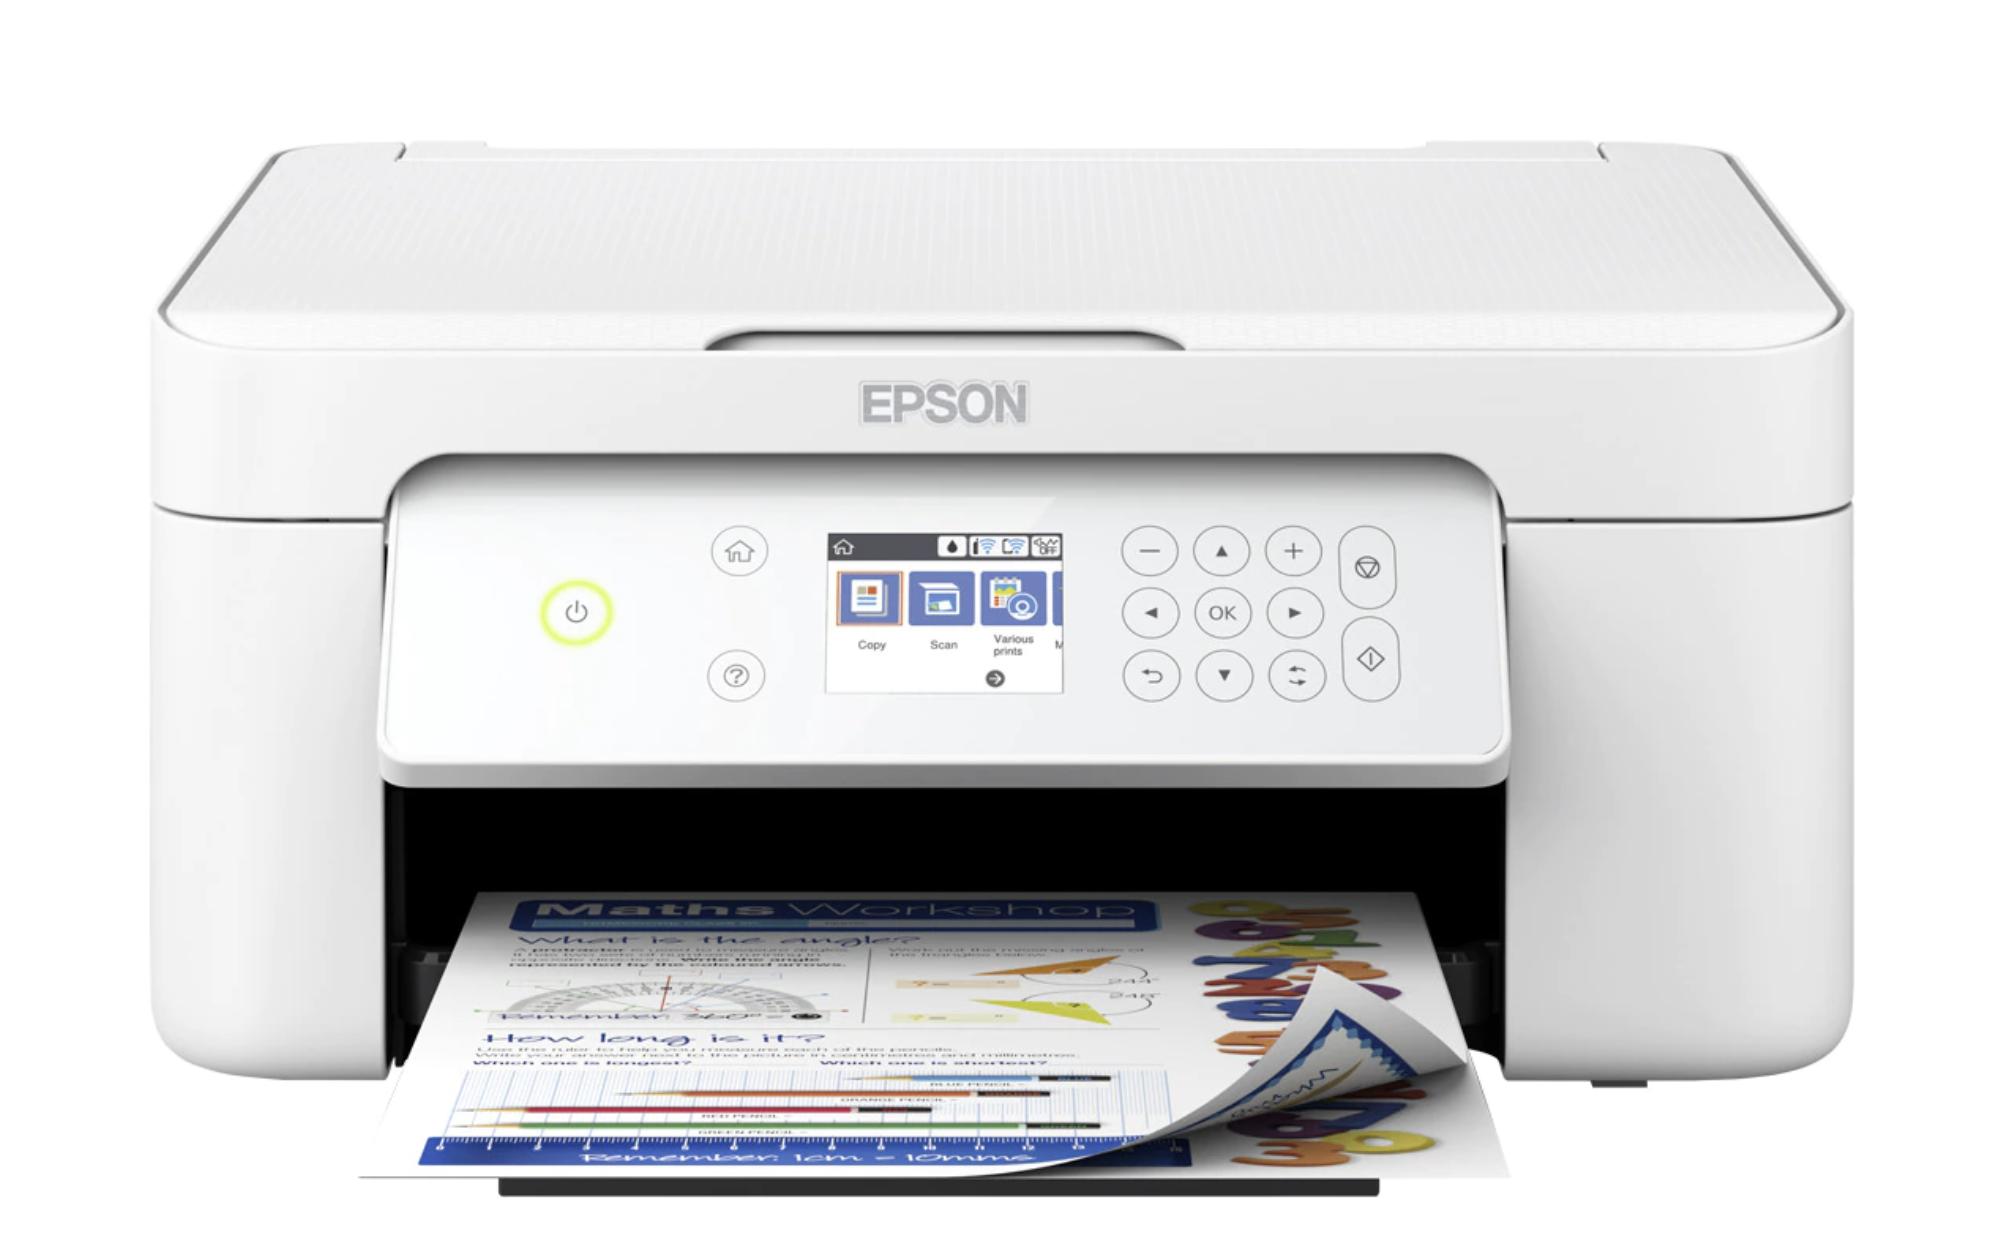 Impresora Multifunción tinta Epson Expression Home XP-4105 Wi-Fi